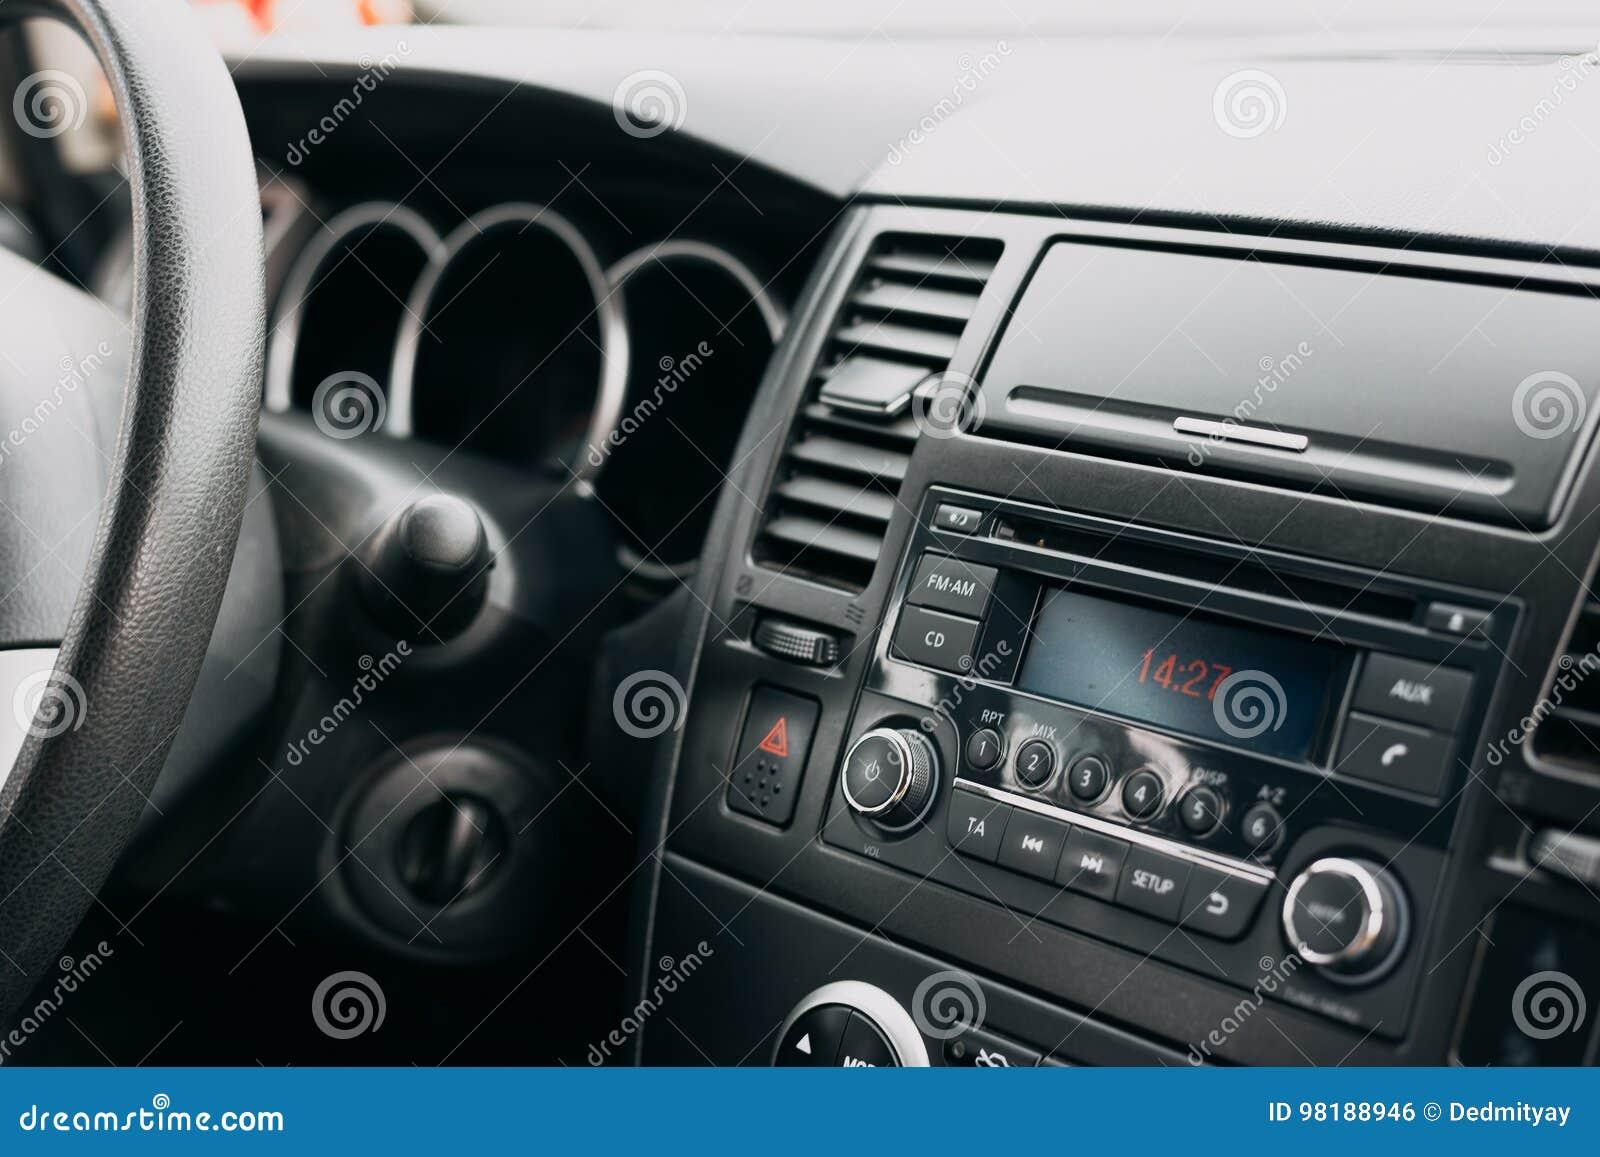 Car interior, control panel, dashboard, radio system